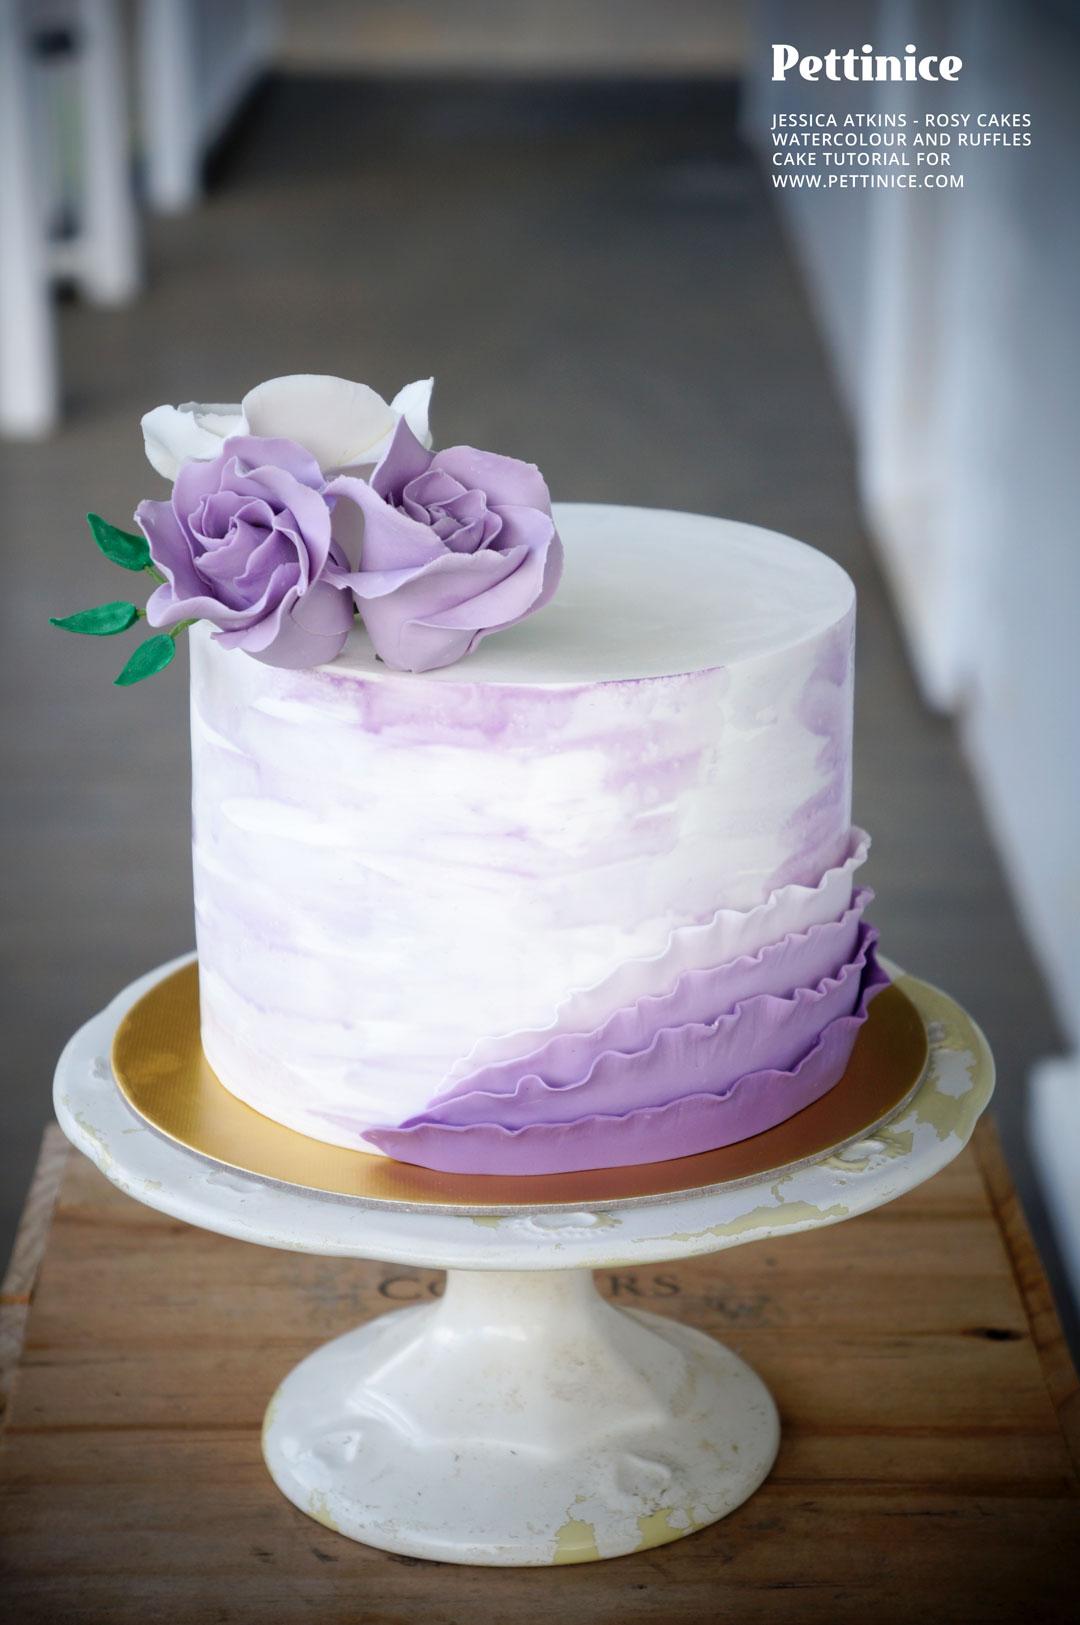 Pettinice How To Make A Watercolour And Ruffle Cake Tutorial